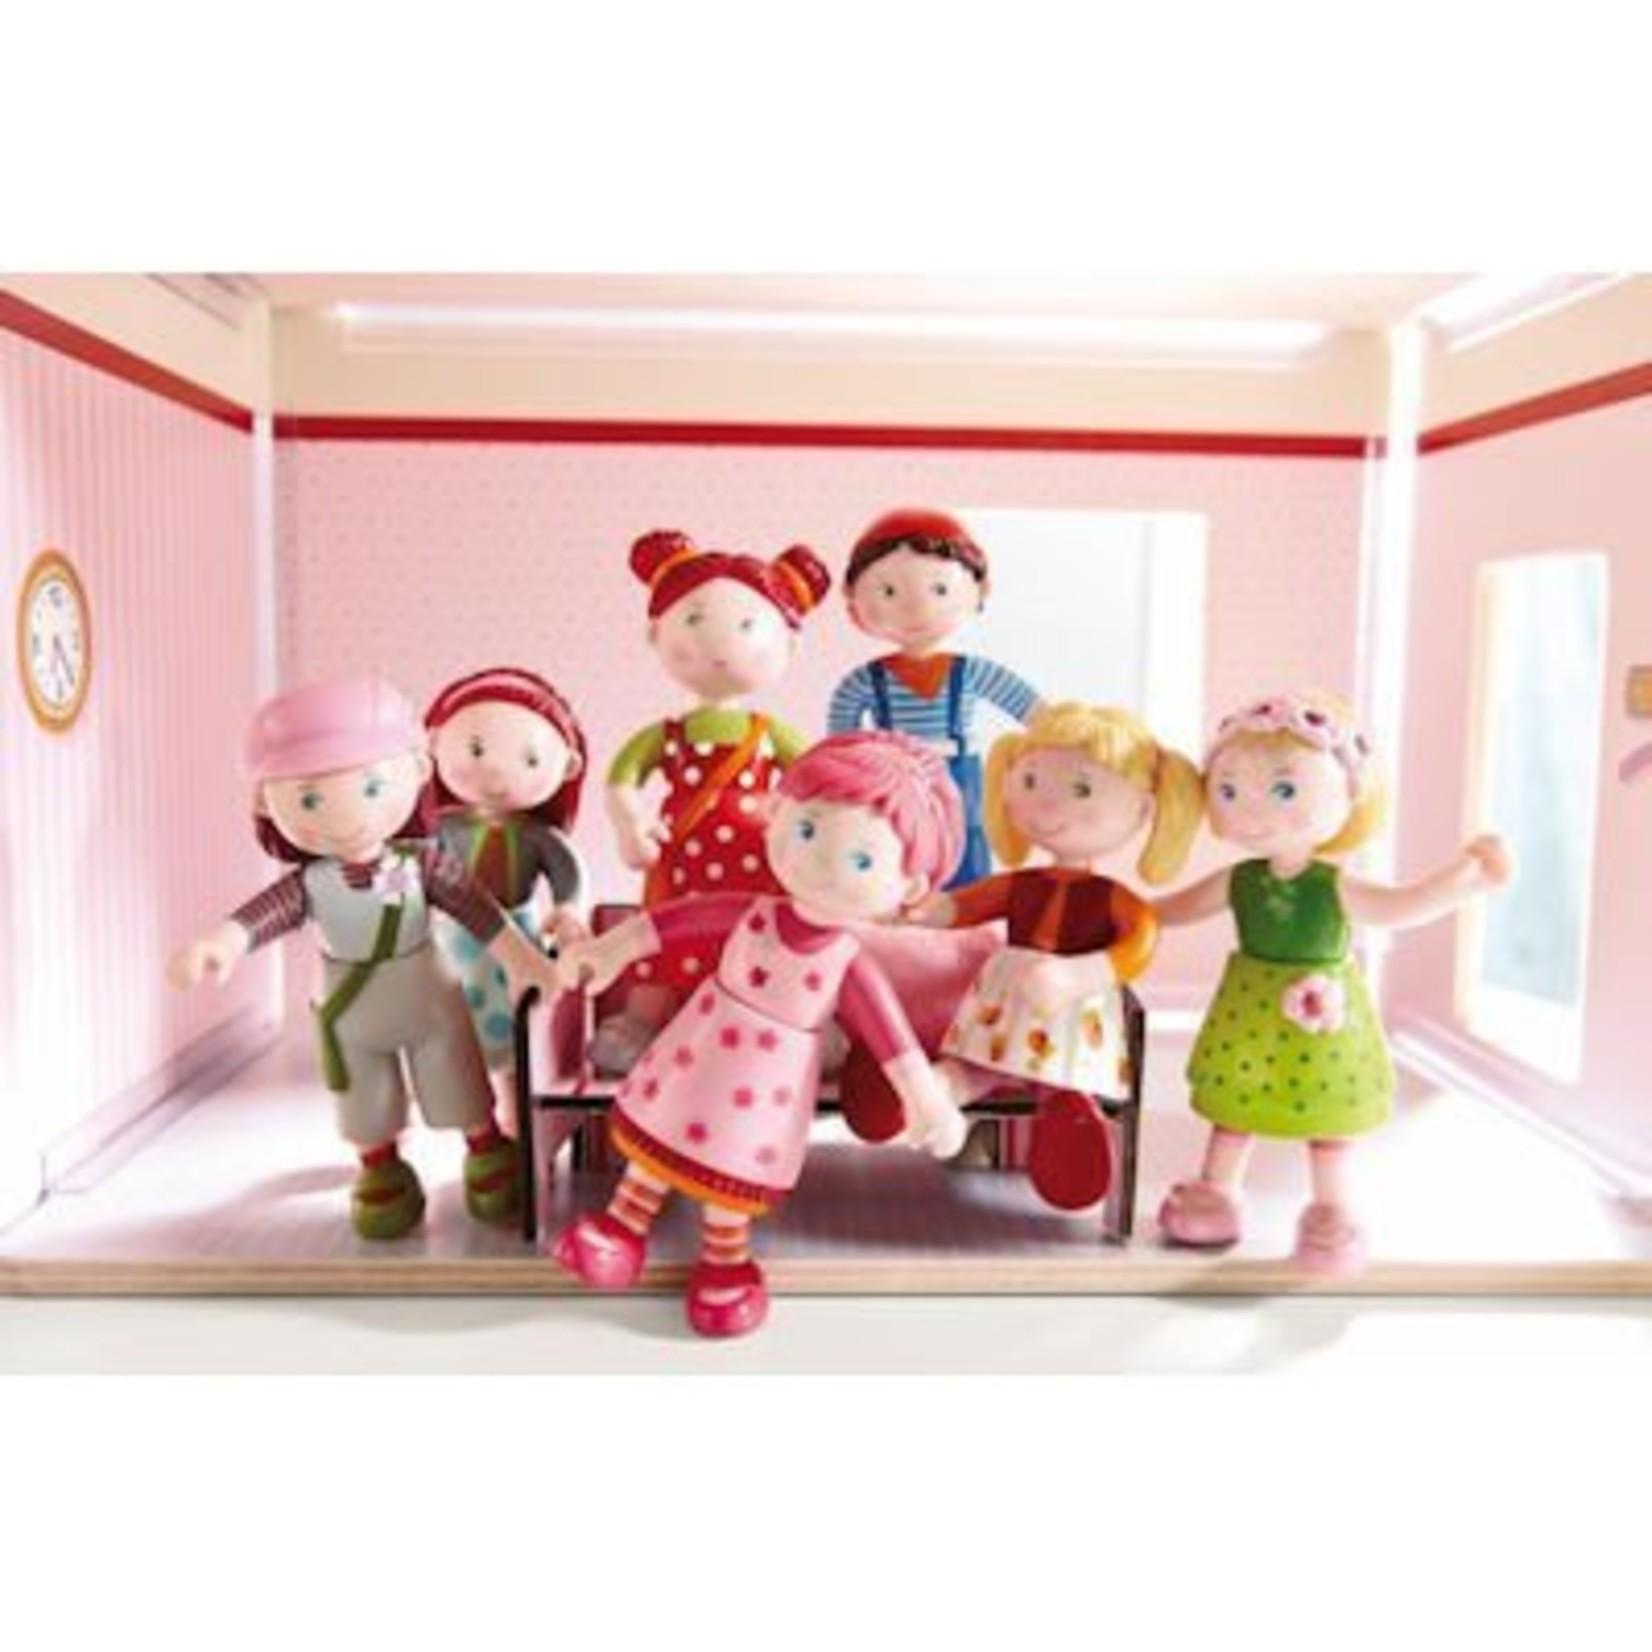 Haba Little Friends poppenhuisfiguurtje Veulen Lissi